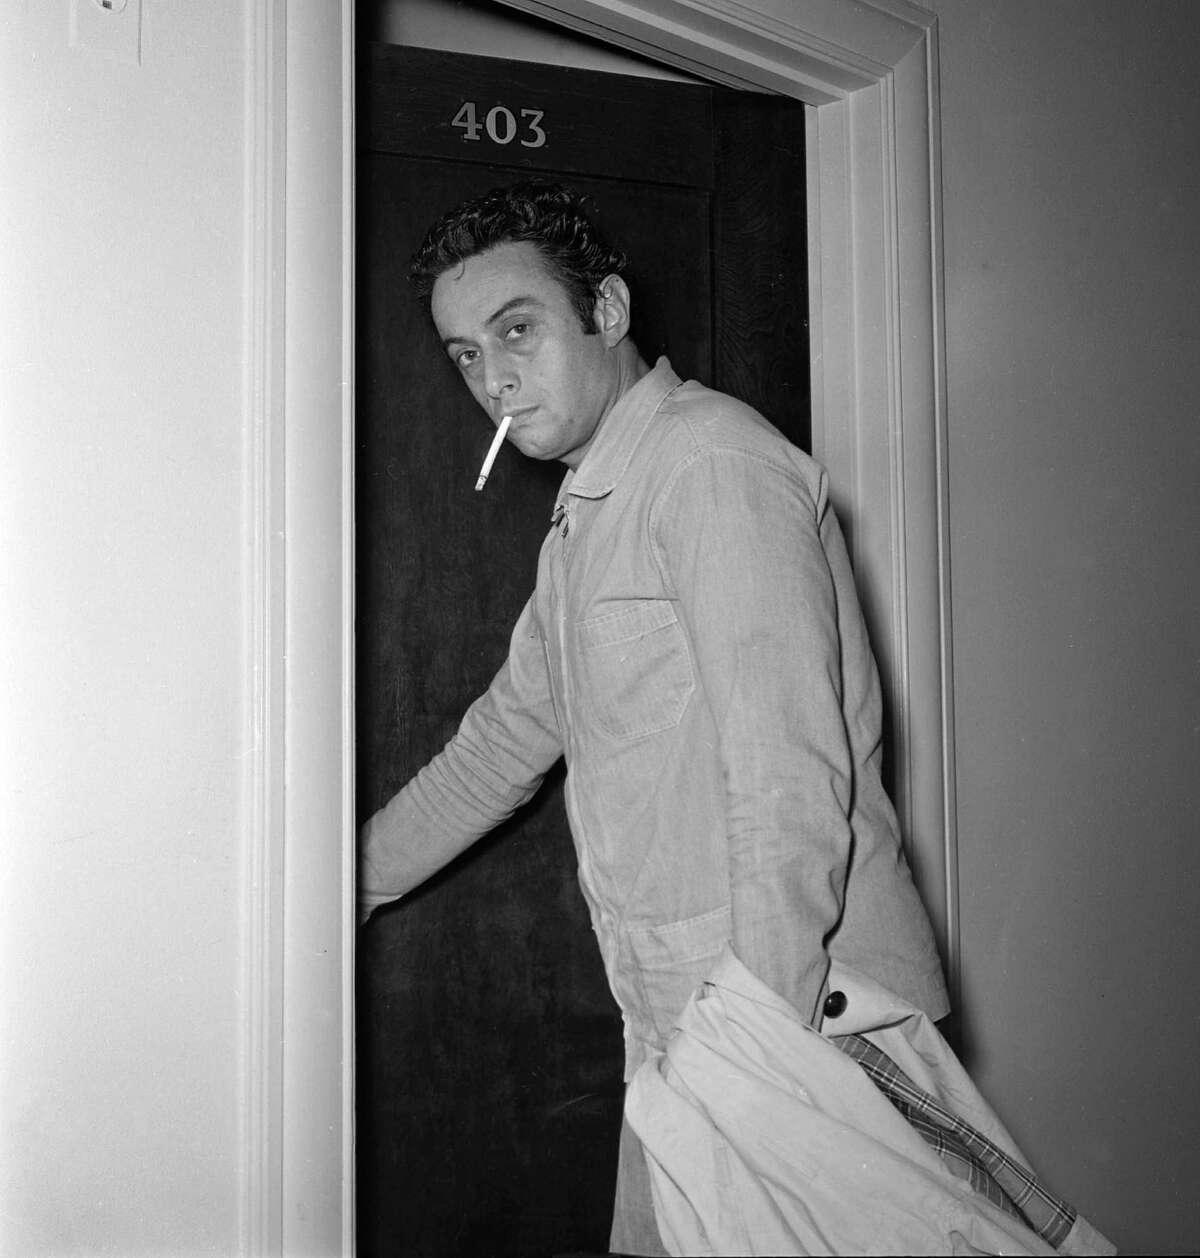 Lenny Bruce after the Jazz Workshop incident on Oct. 3, 1961.